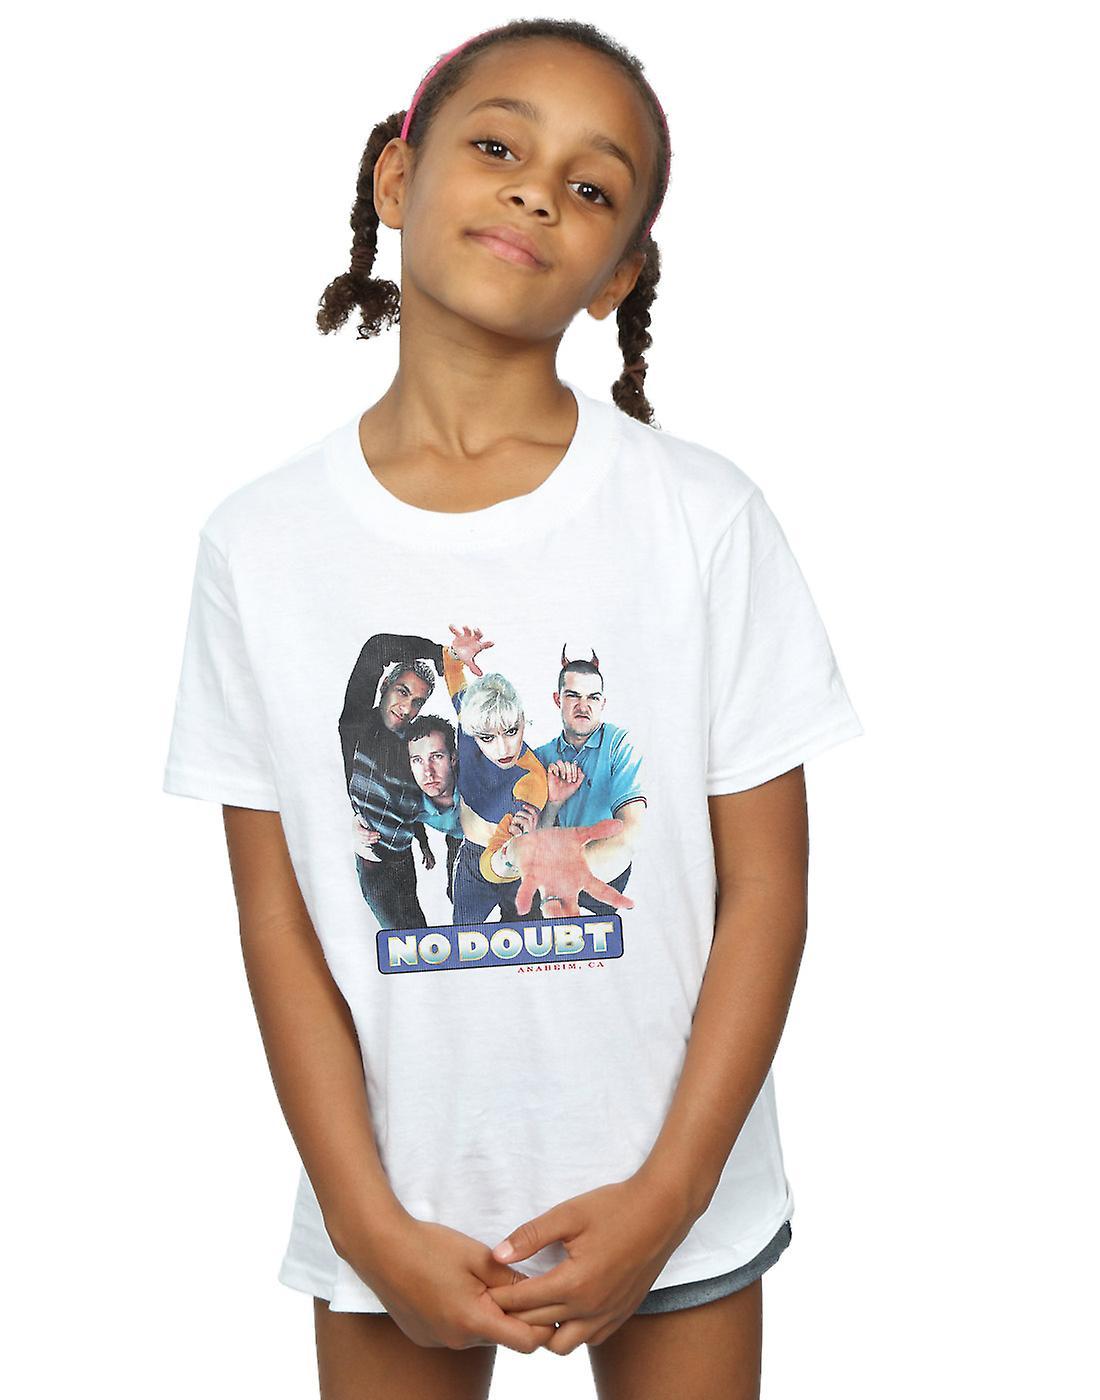 No Doubt Girls Vintage Photo T-Shirt